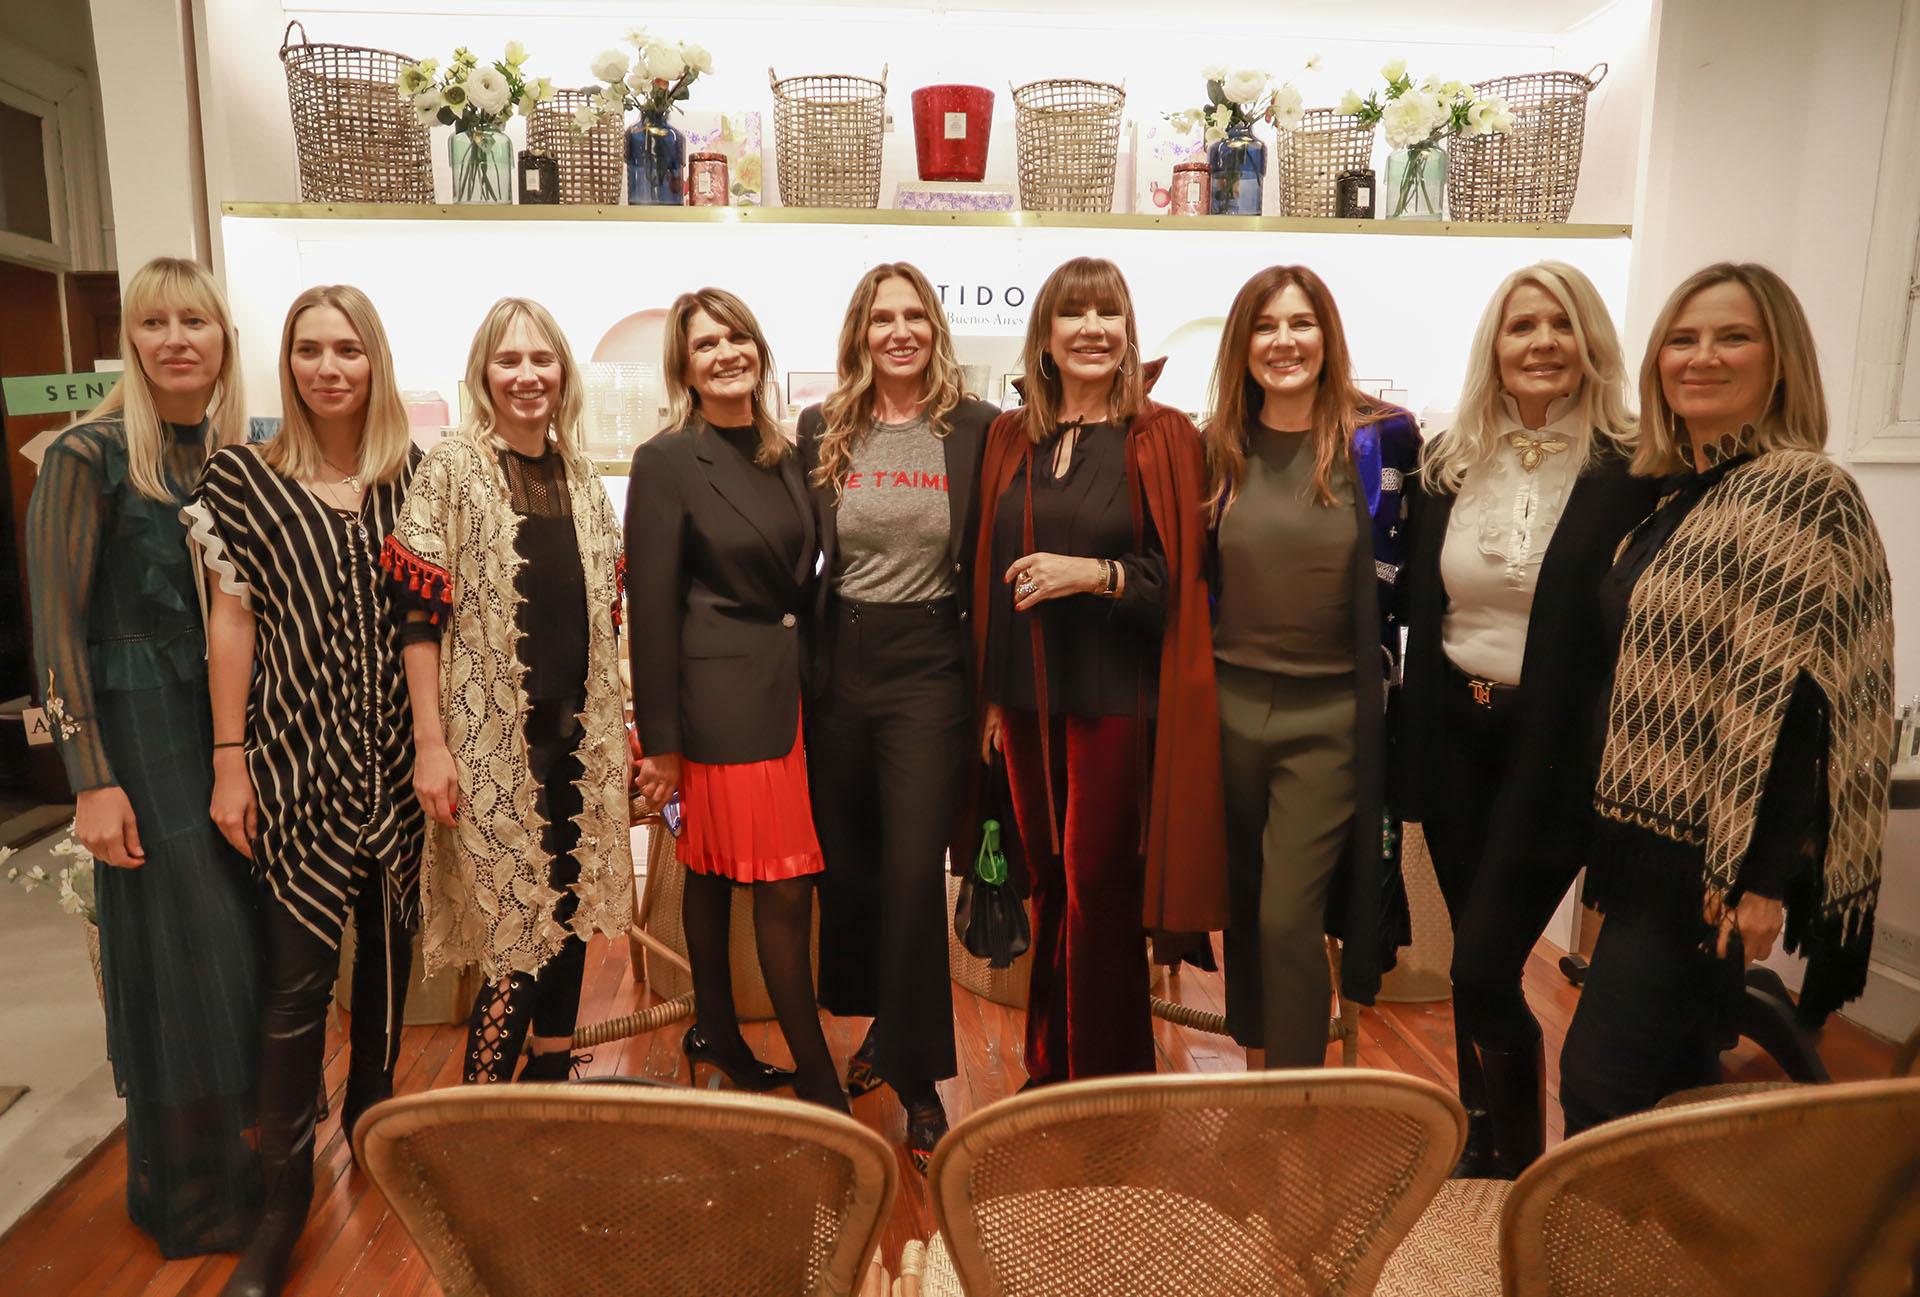 Teresa Calandra, Ginette Reynal, Mora Furtado y Evelyn Scheidl acompañaron a su amiga, Andrea Frigerio